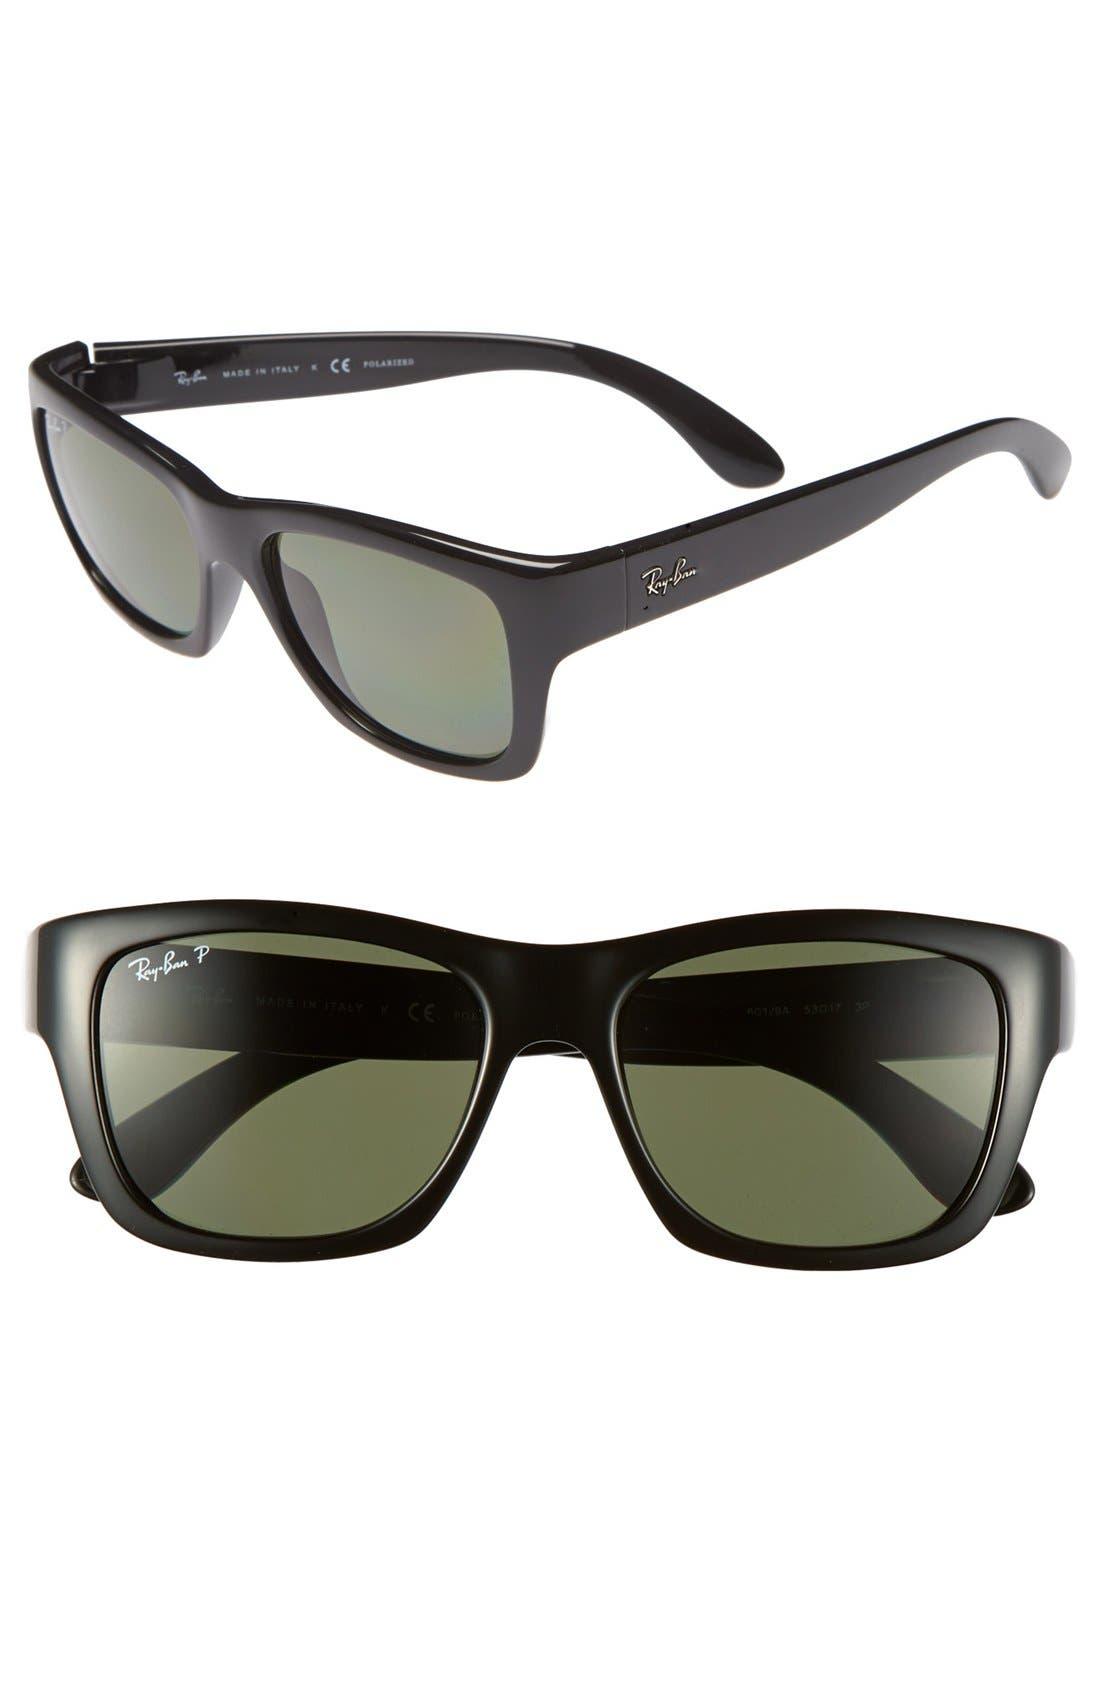 Main Image - Ray-Ban 'Square Glam' 53mm Polarized Sunglasses